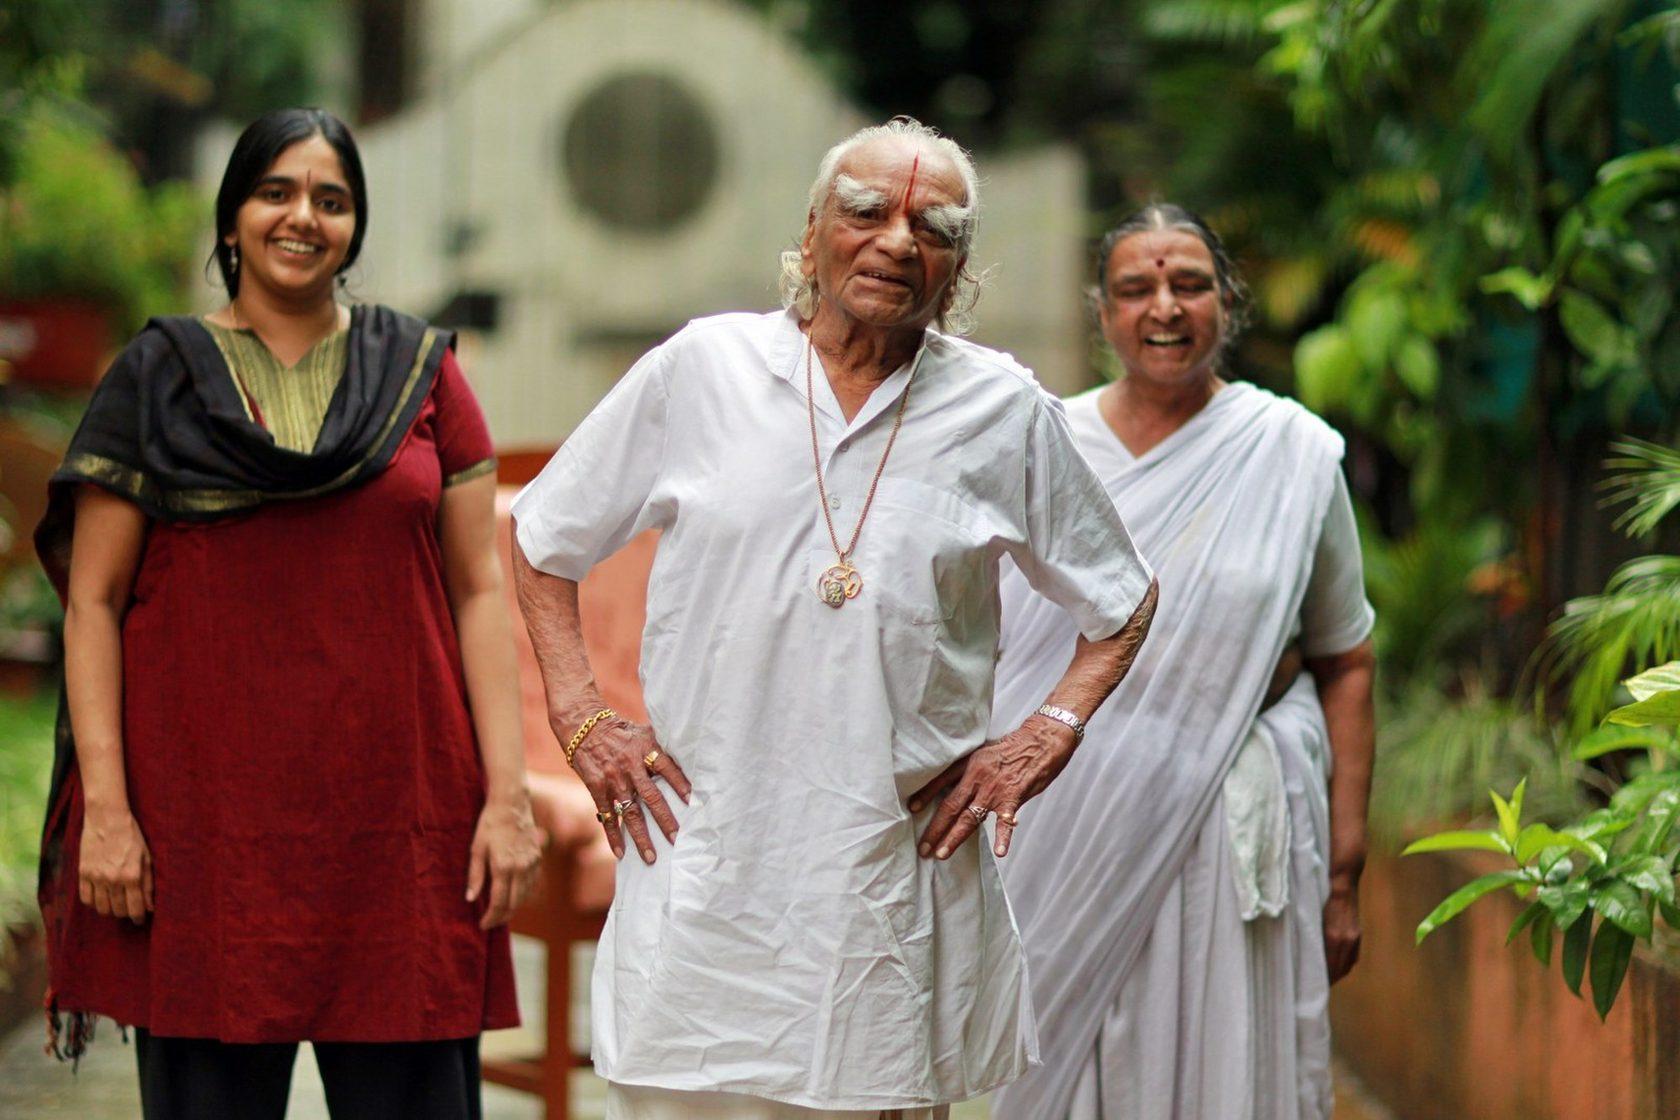 datiranje niranjan iyengar međurasno druženje u Londonu uk